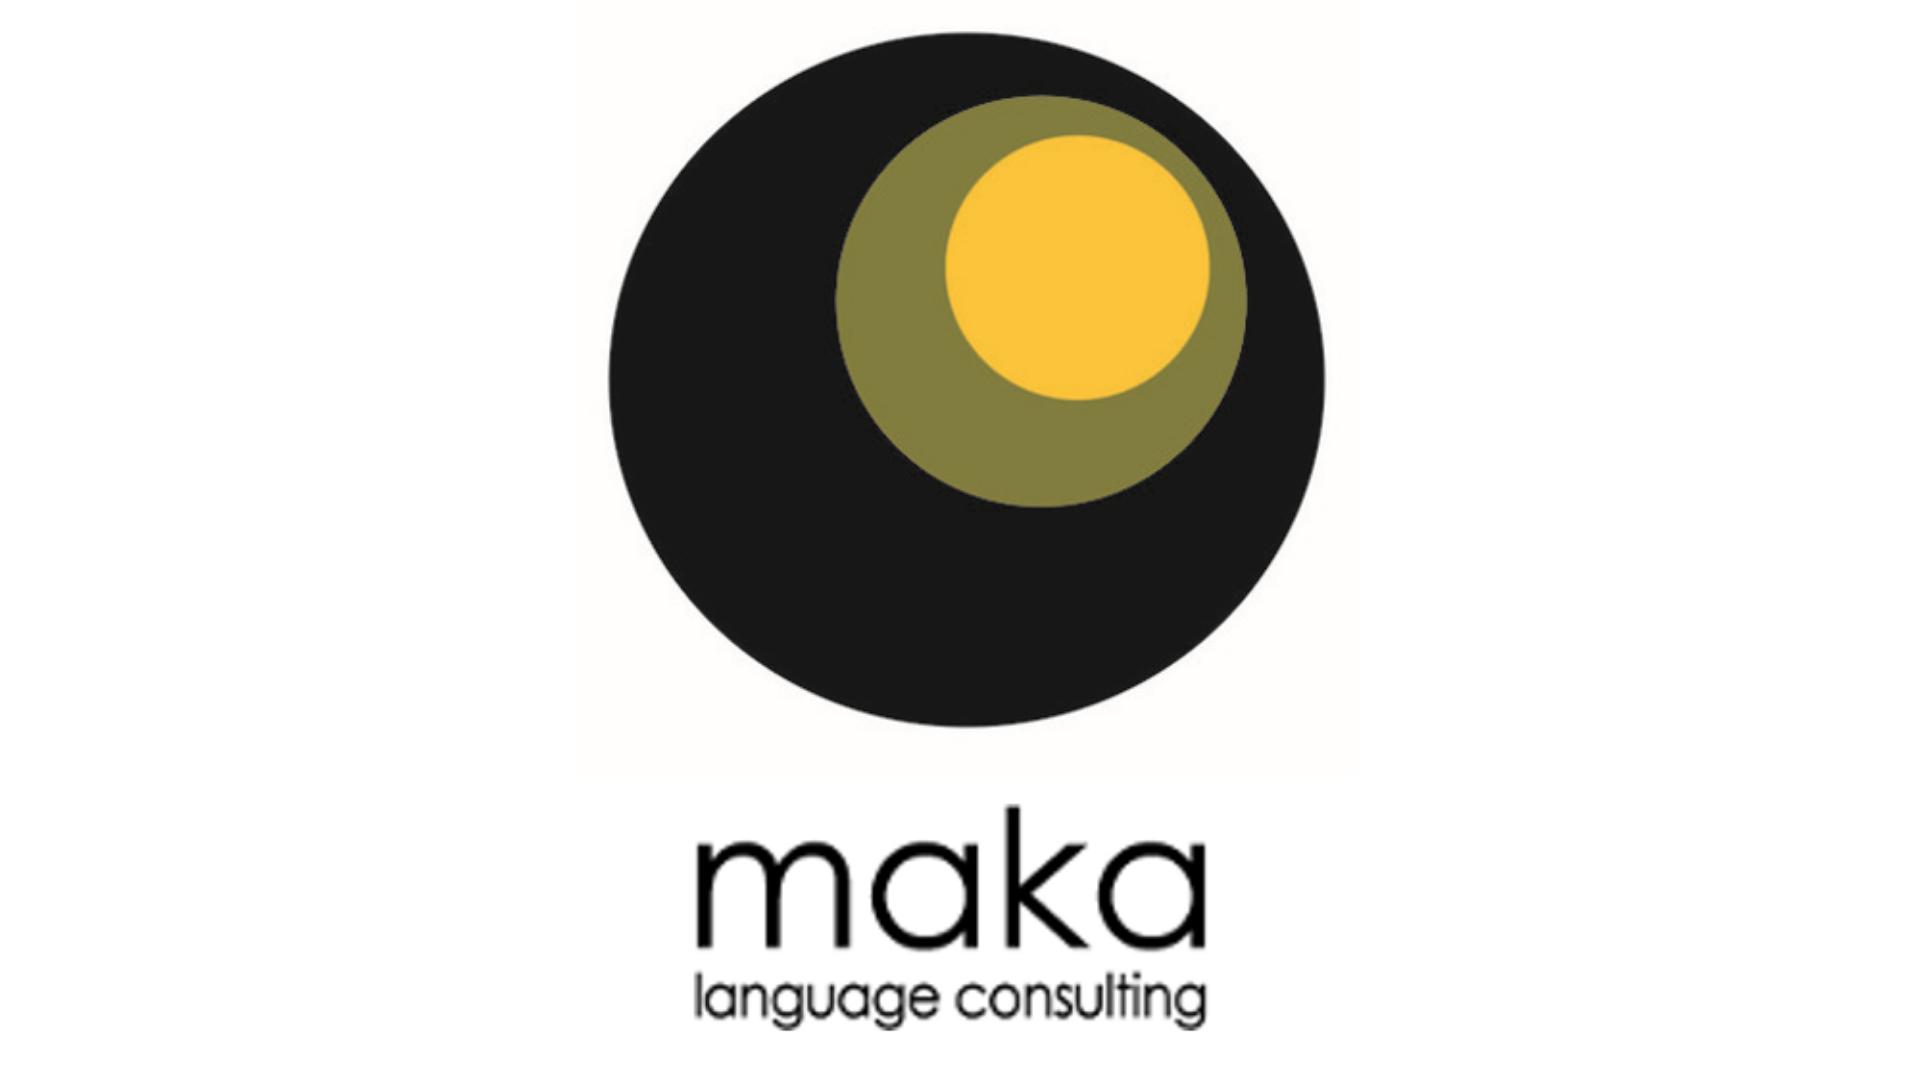 maka-language-consulting-milano-corsi-giapponese